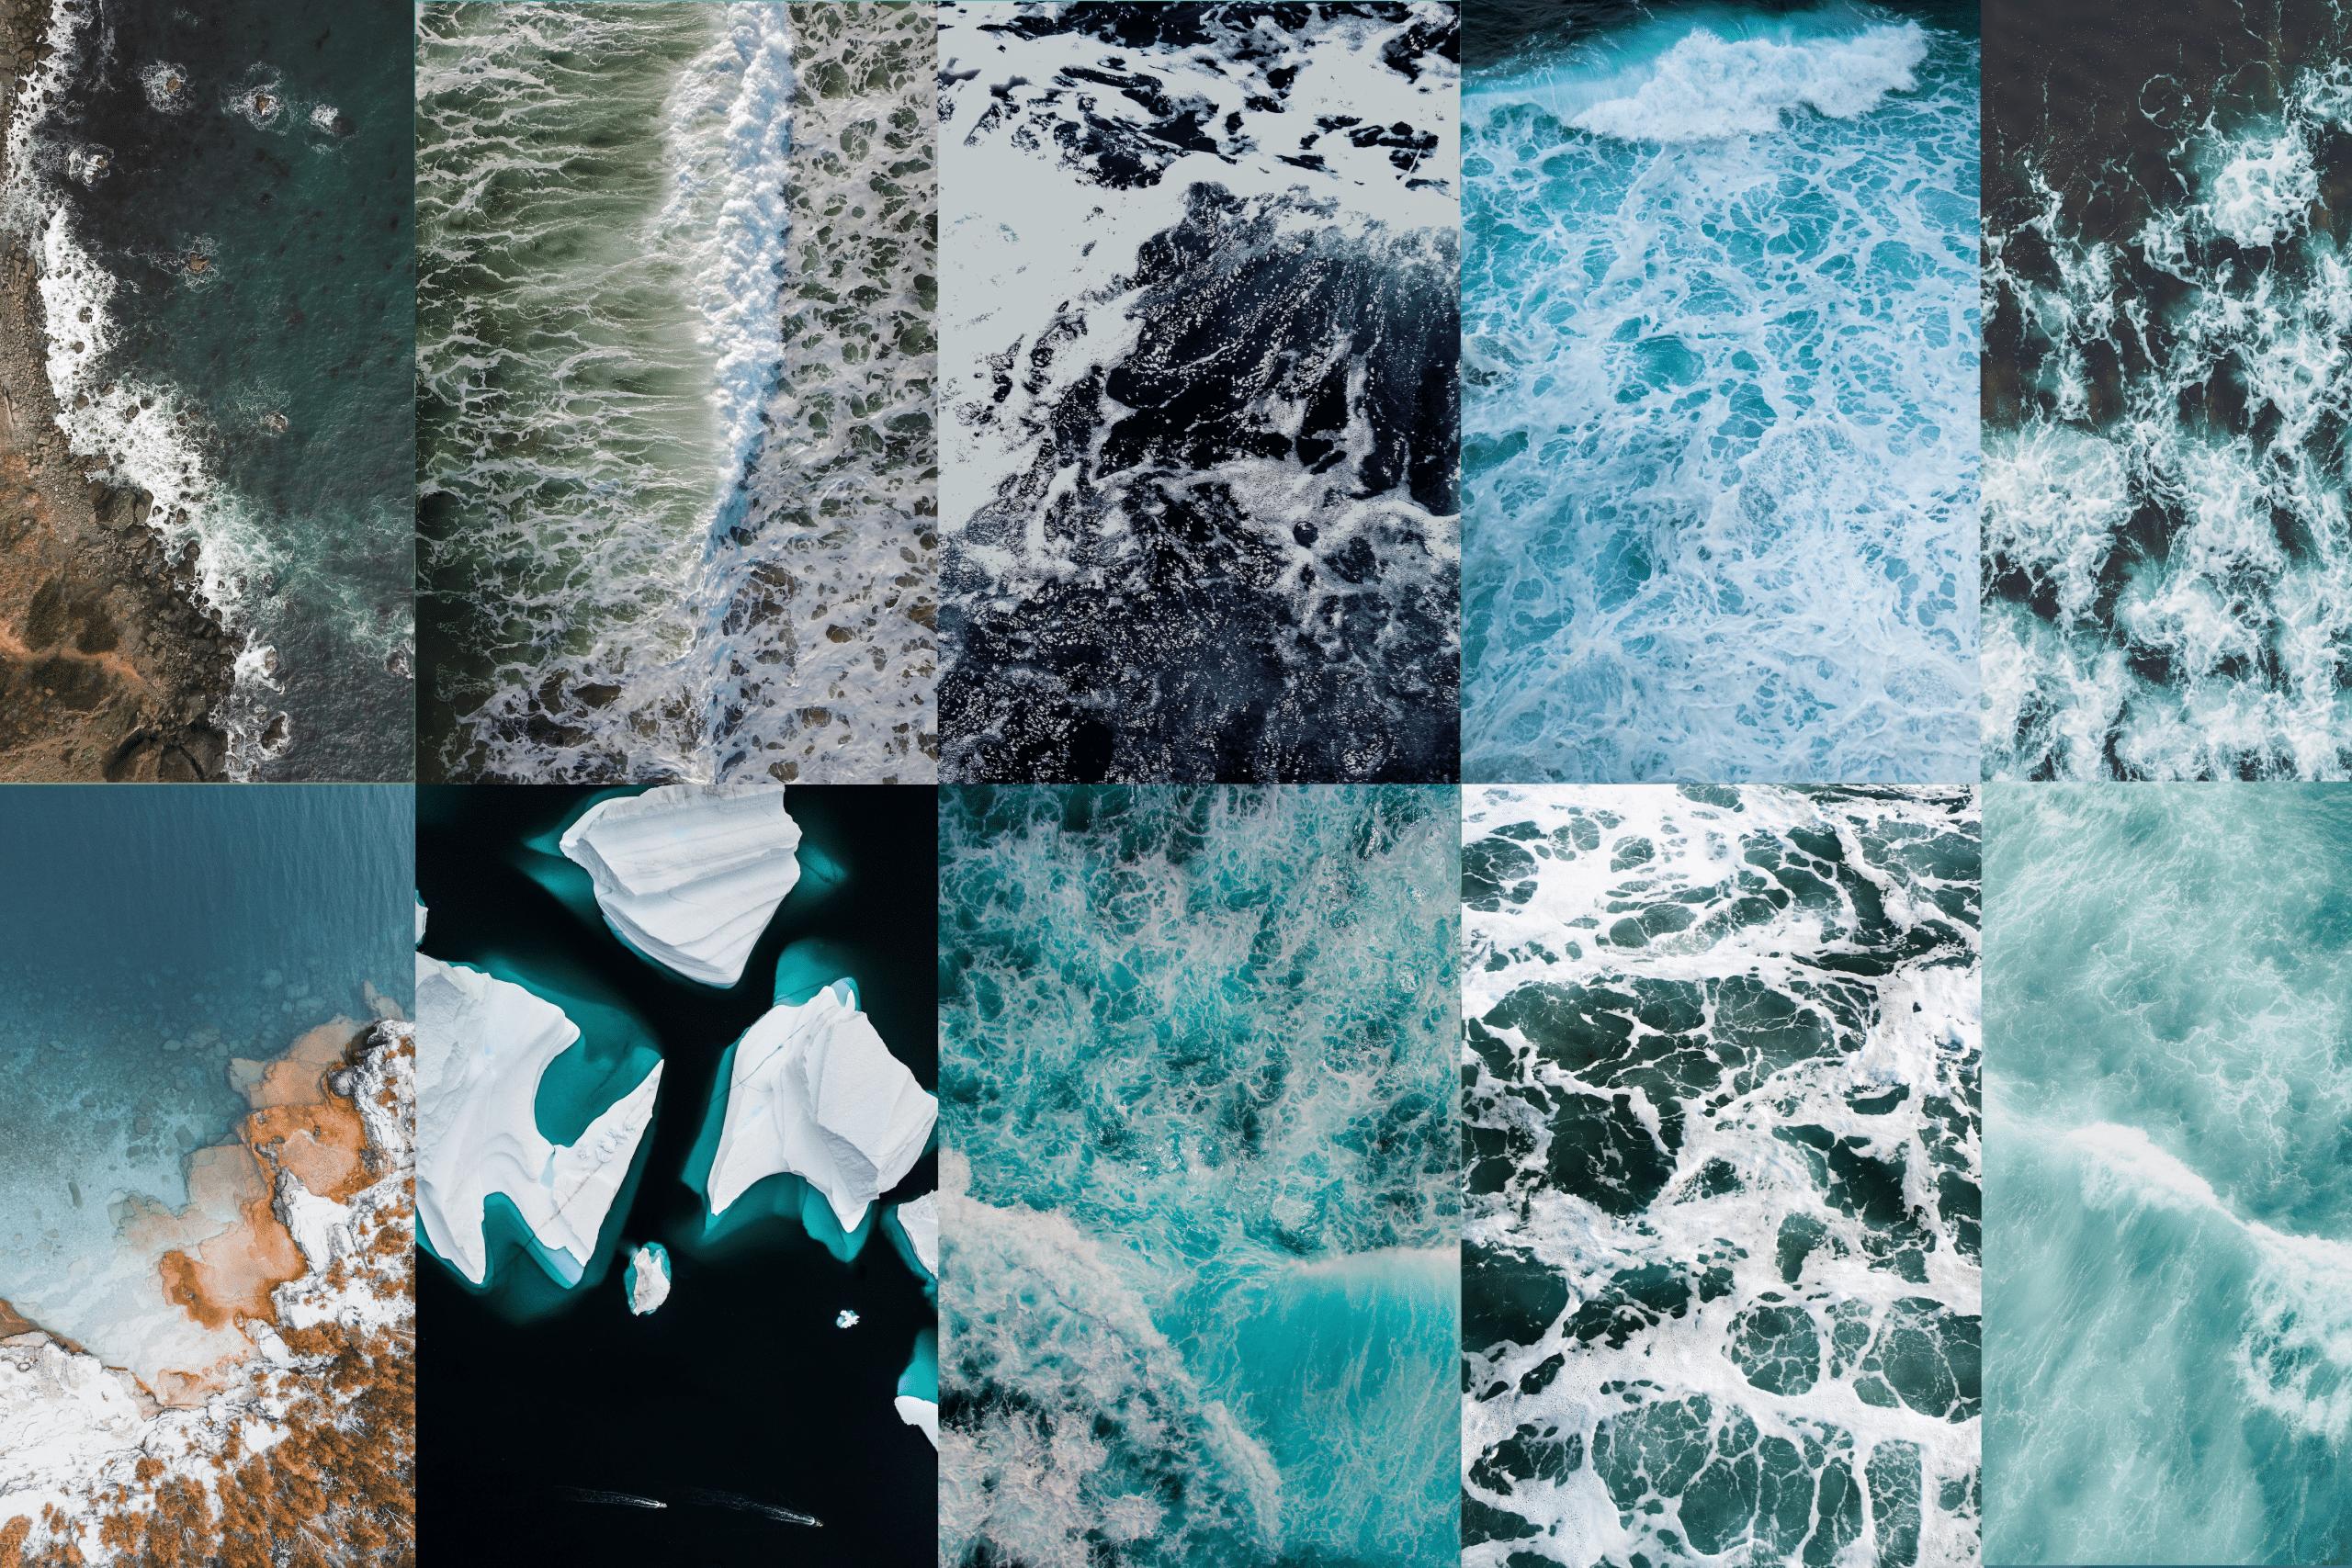 Water patterns